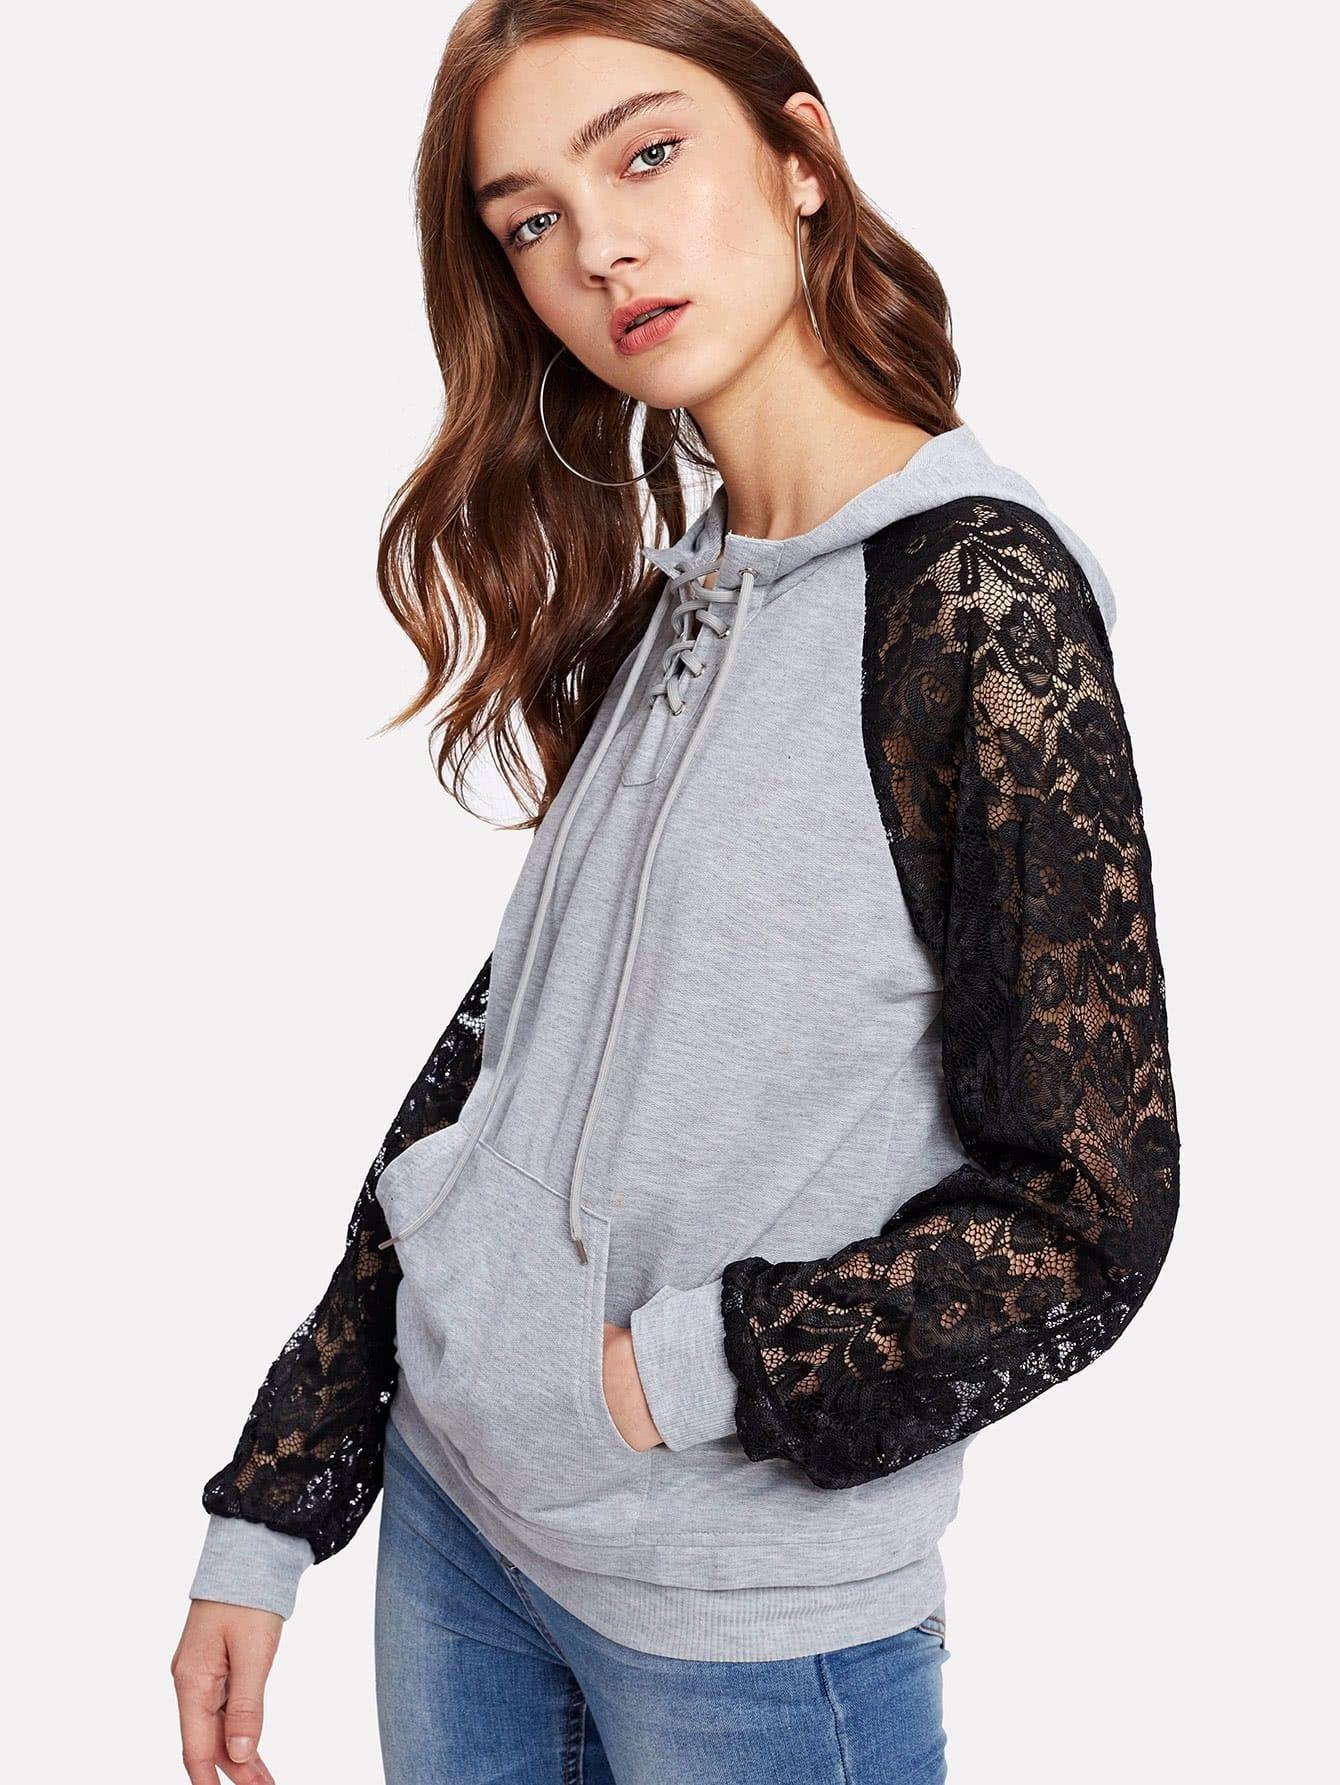 Contrast Lace Raglan Sleeve Lace Up Hoodie contrast panel sleeve lace up hoodie